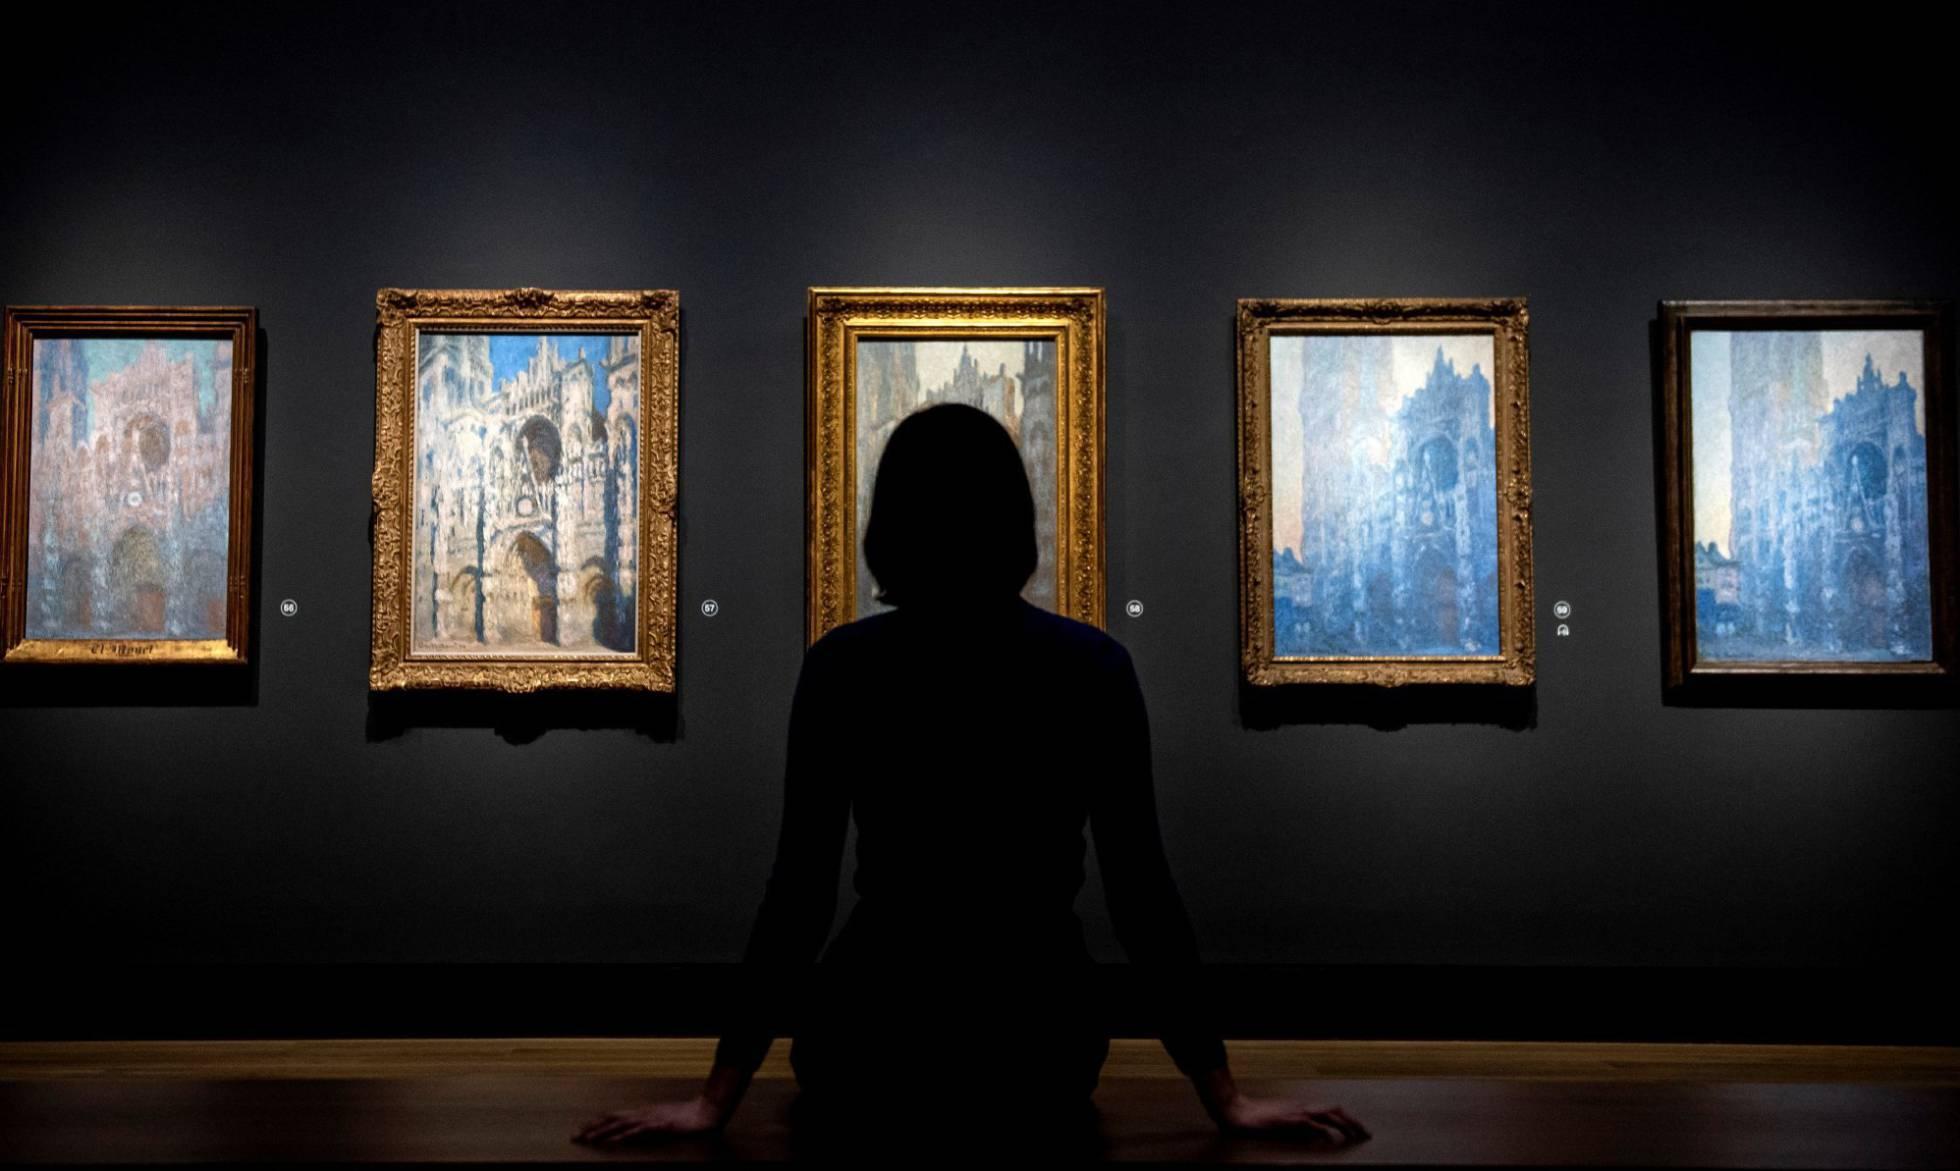 Londres celebra a Monet como el artista que intentó pintar el aire